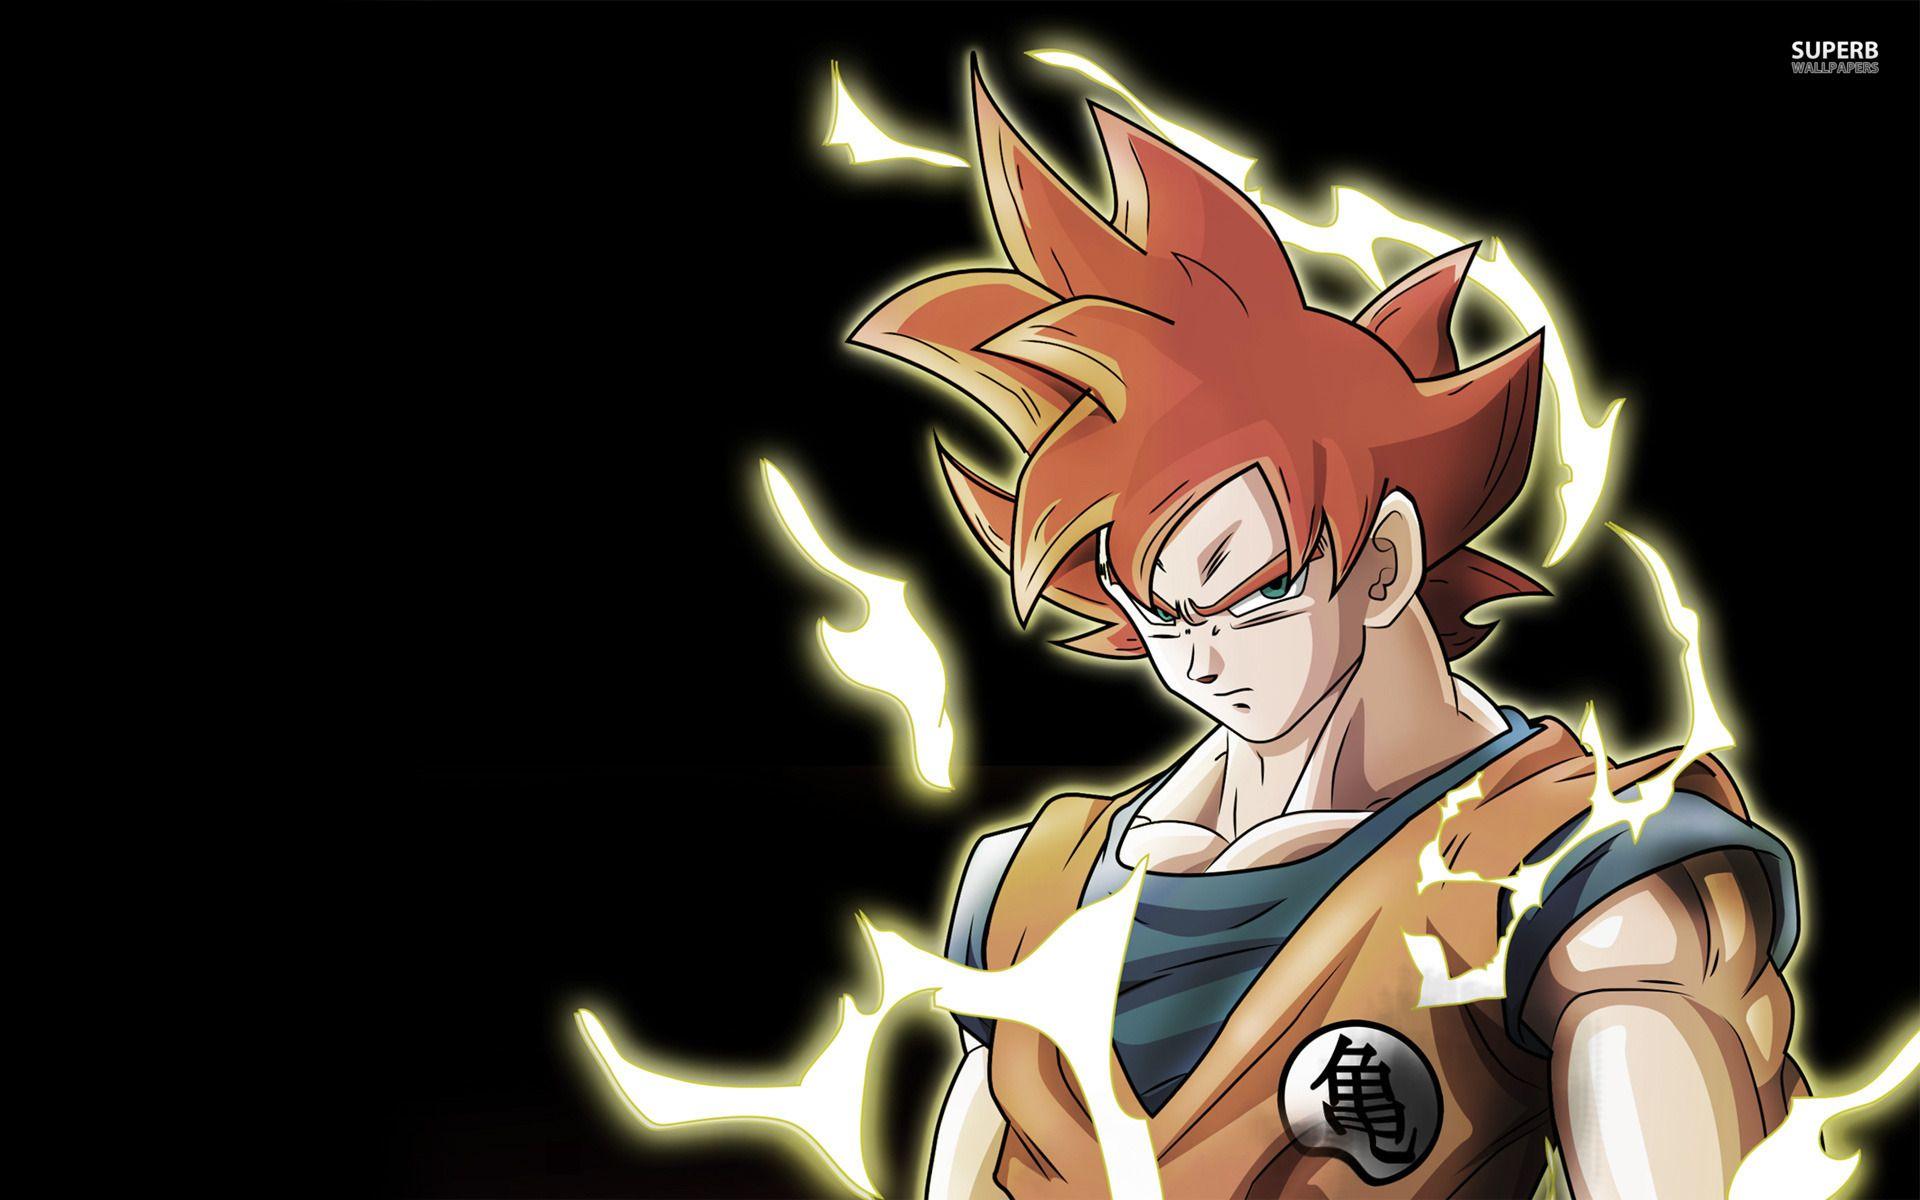 Dragon Ball Z Hd Wallpapers Backgrounds Wallpaper Hd Wallpapers